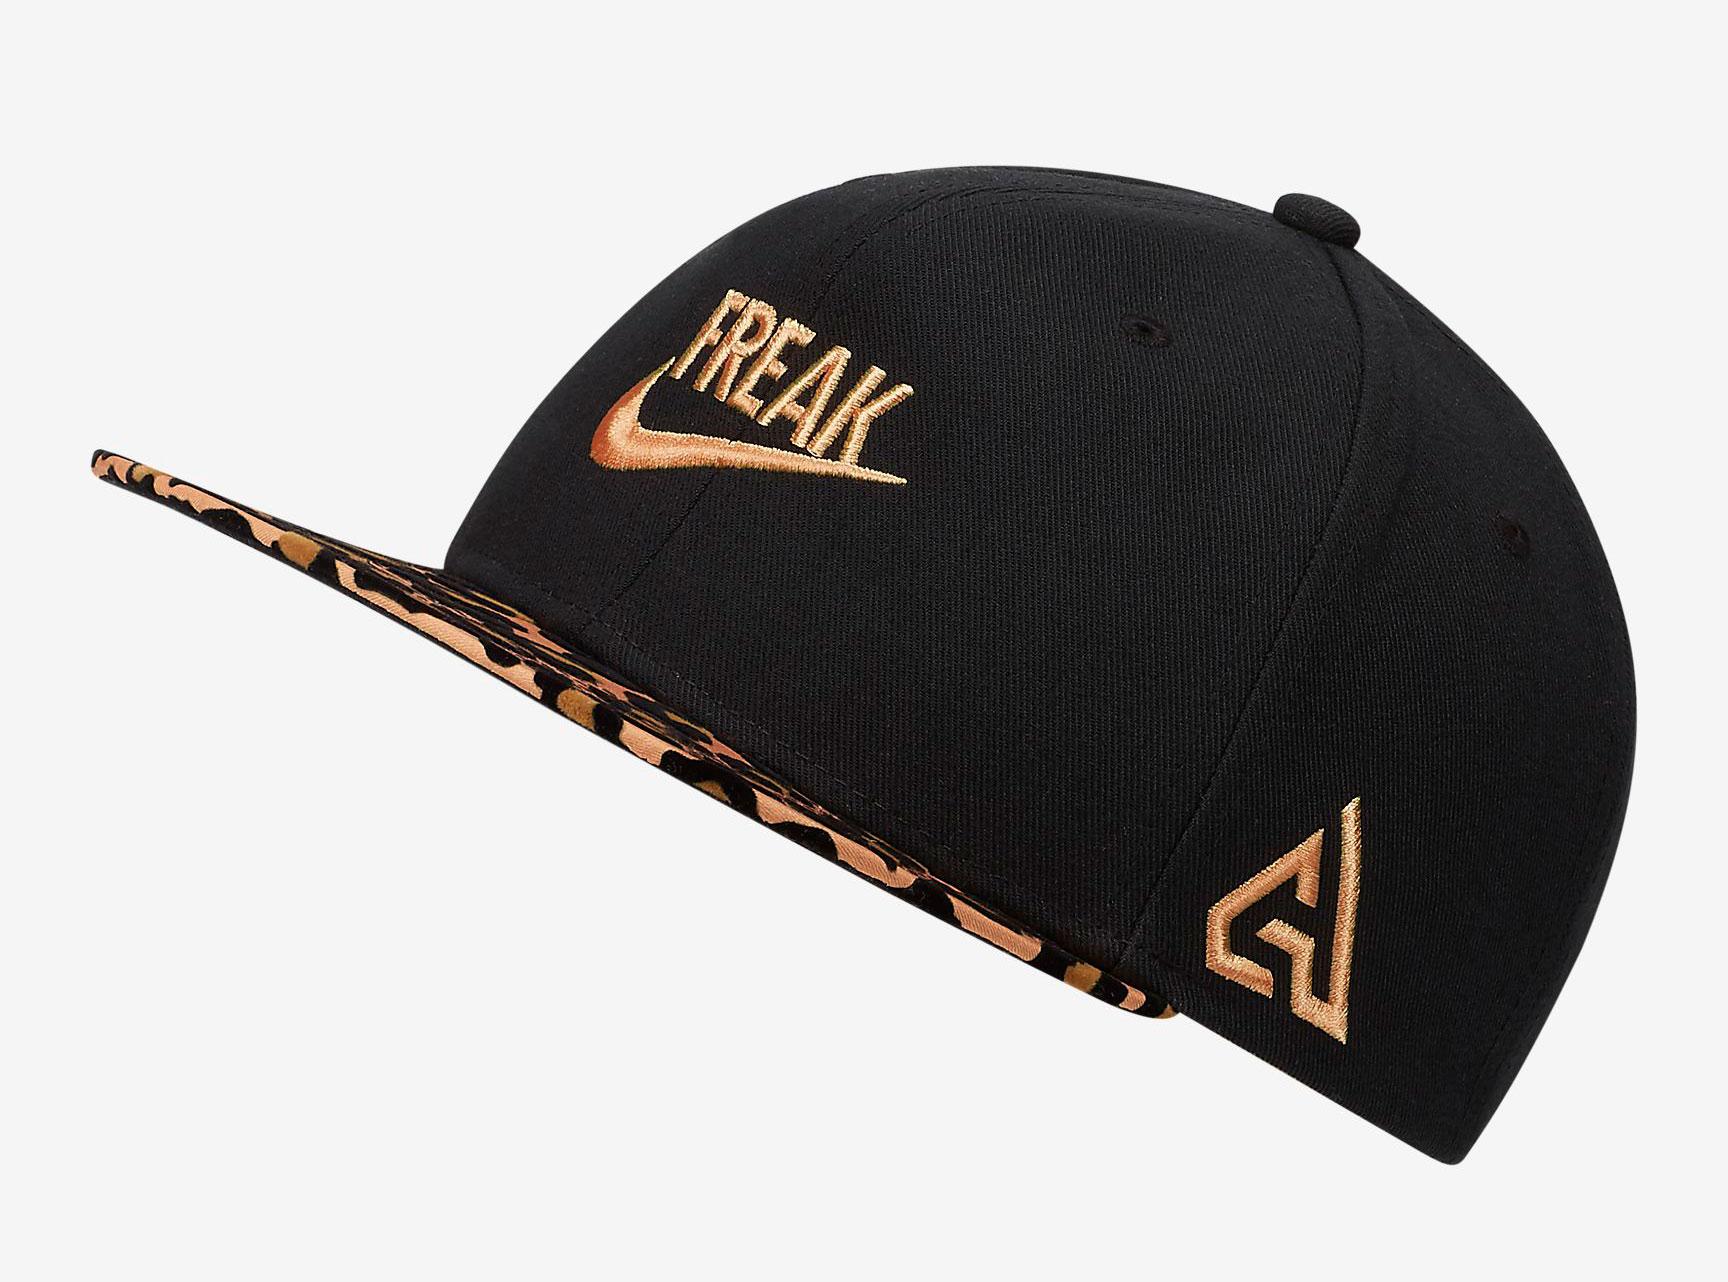 nike-zoom-freak-1-coming-to-america-hat